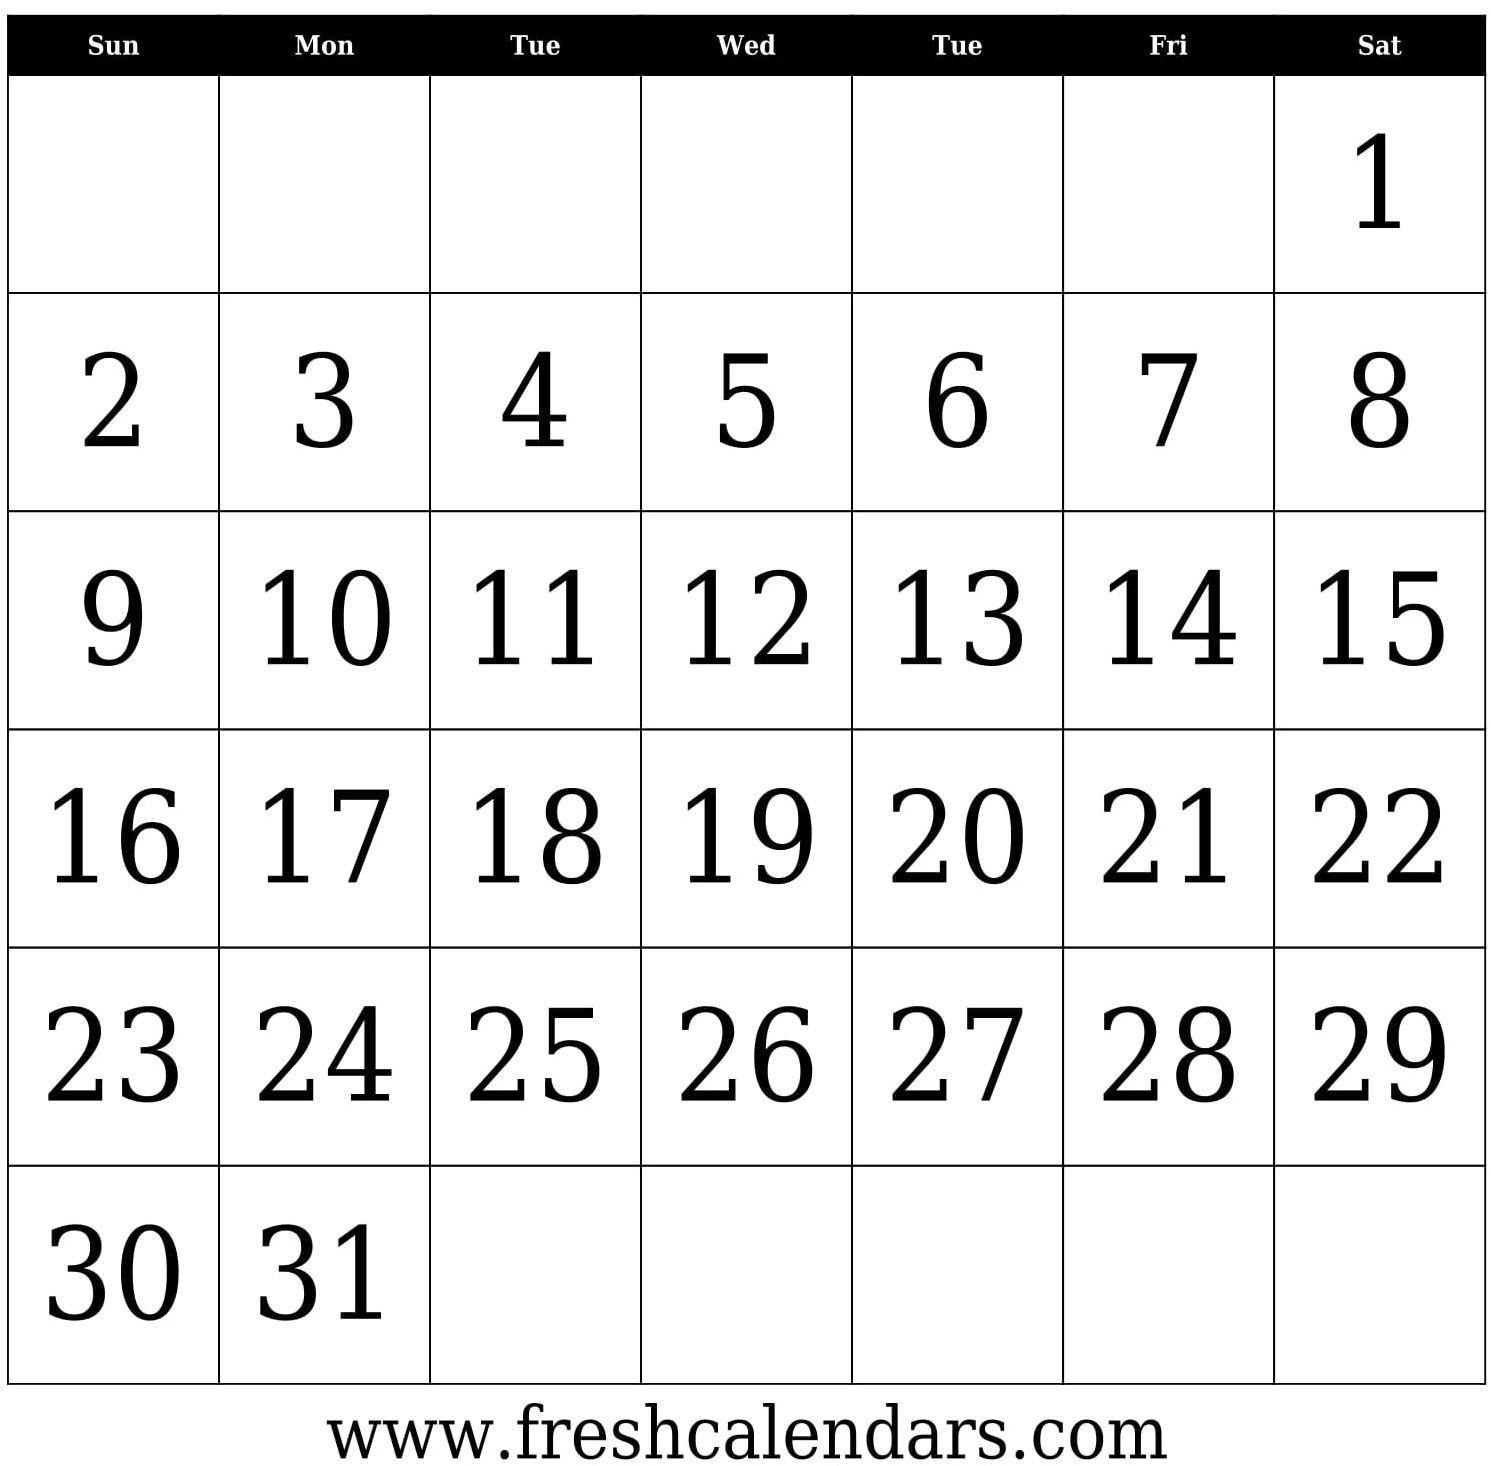 Free Printable 2020 Calendar | Calendar Template, Blank